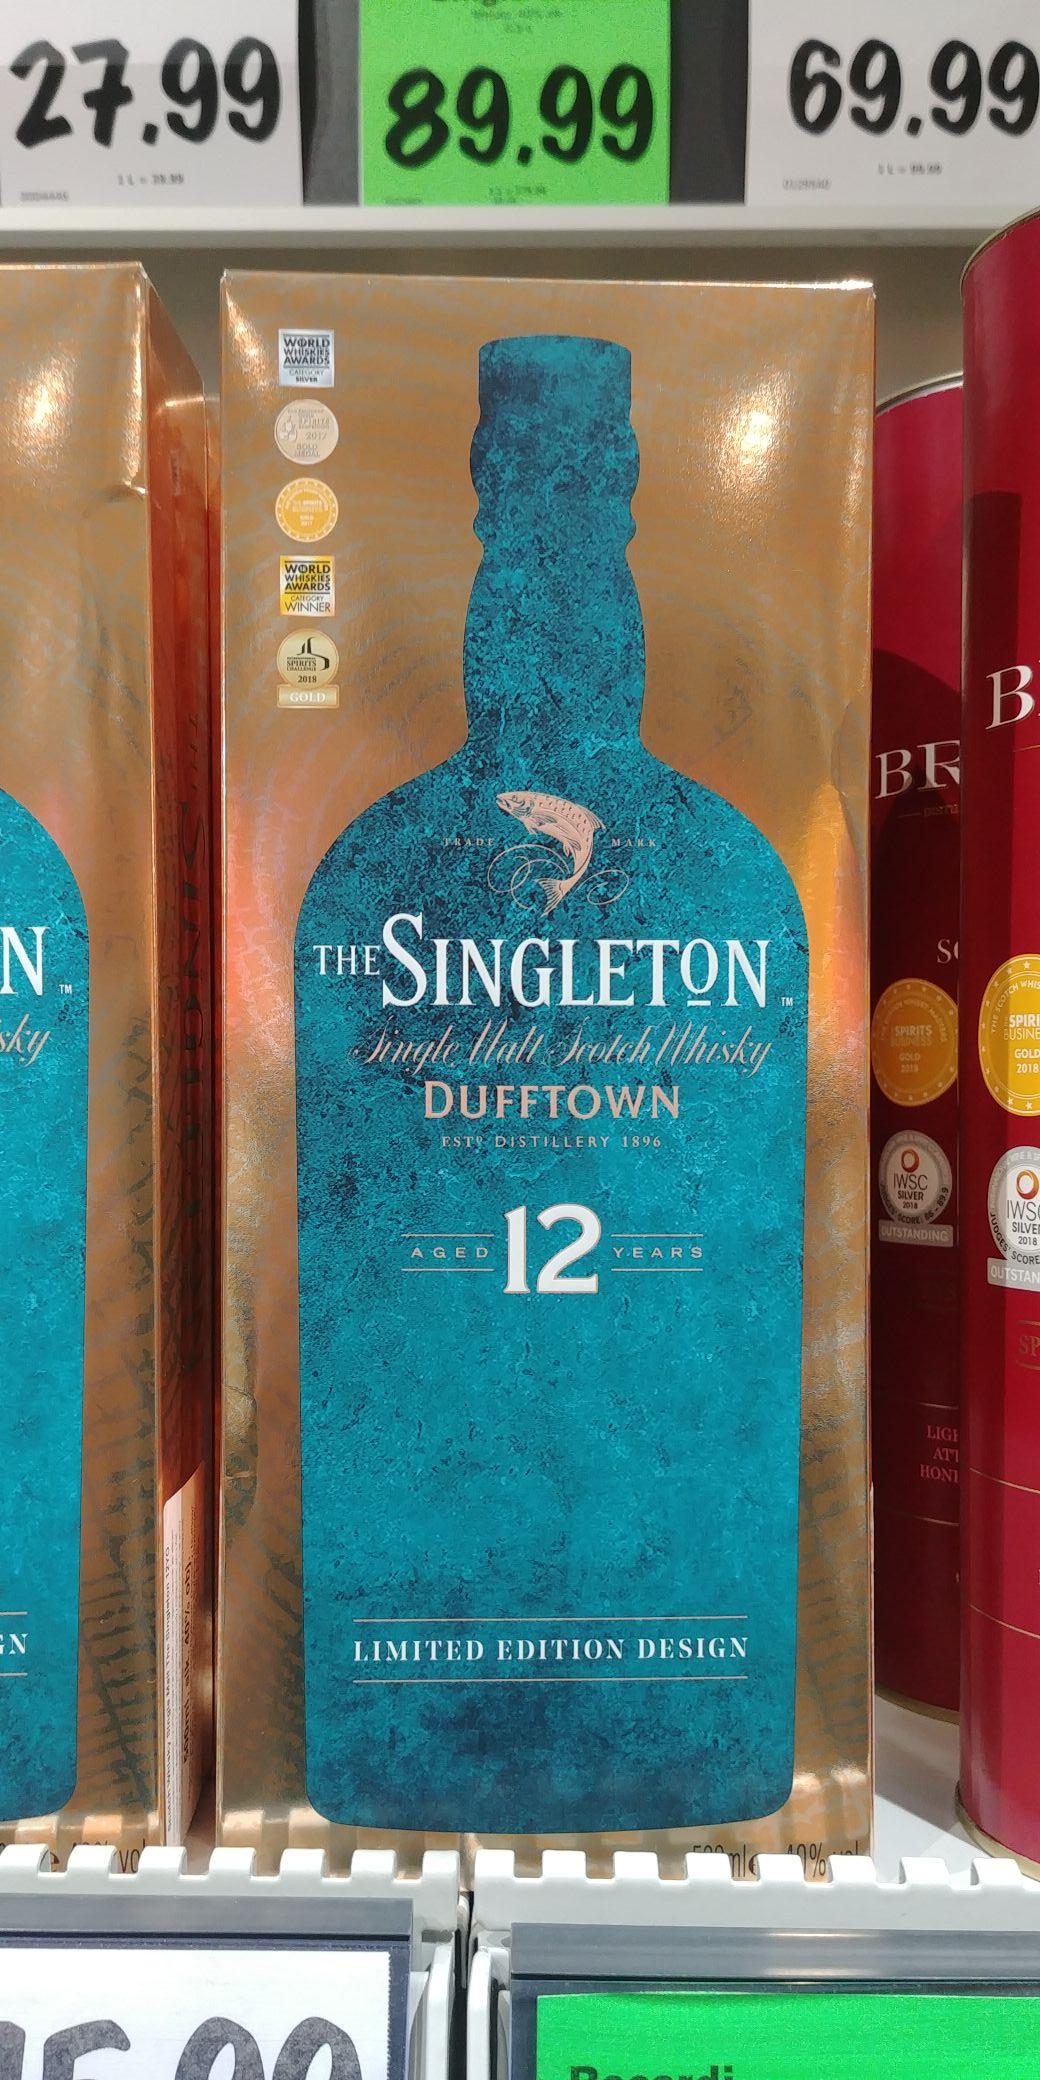 Whisky Singleton of Dufftown 12yo @Lidl